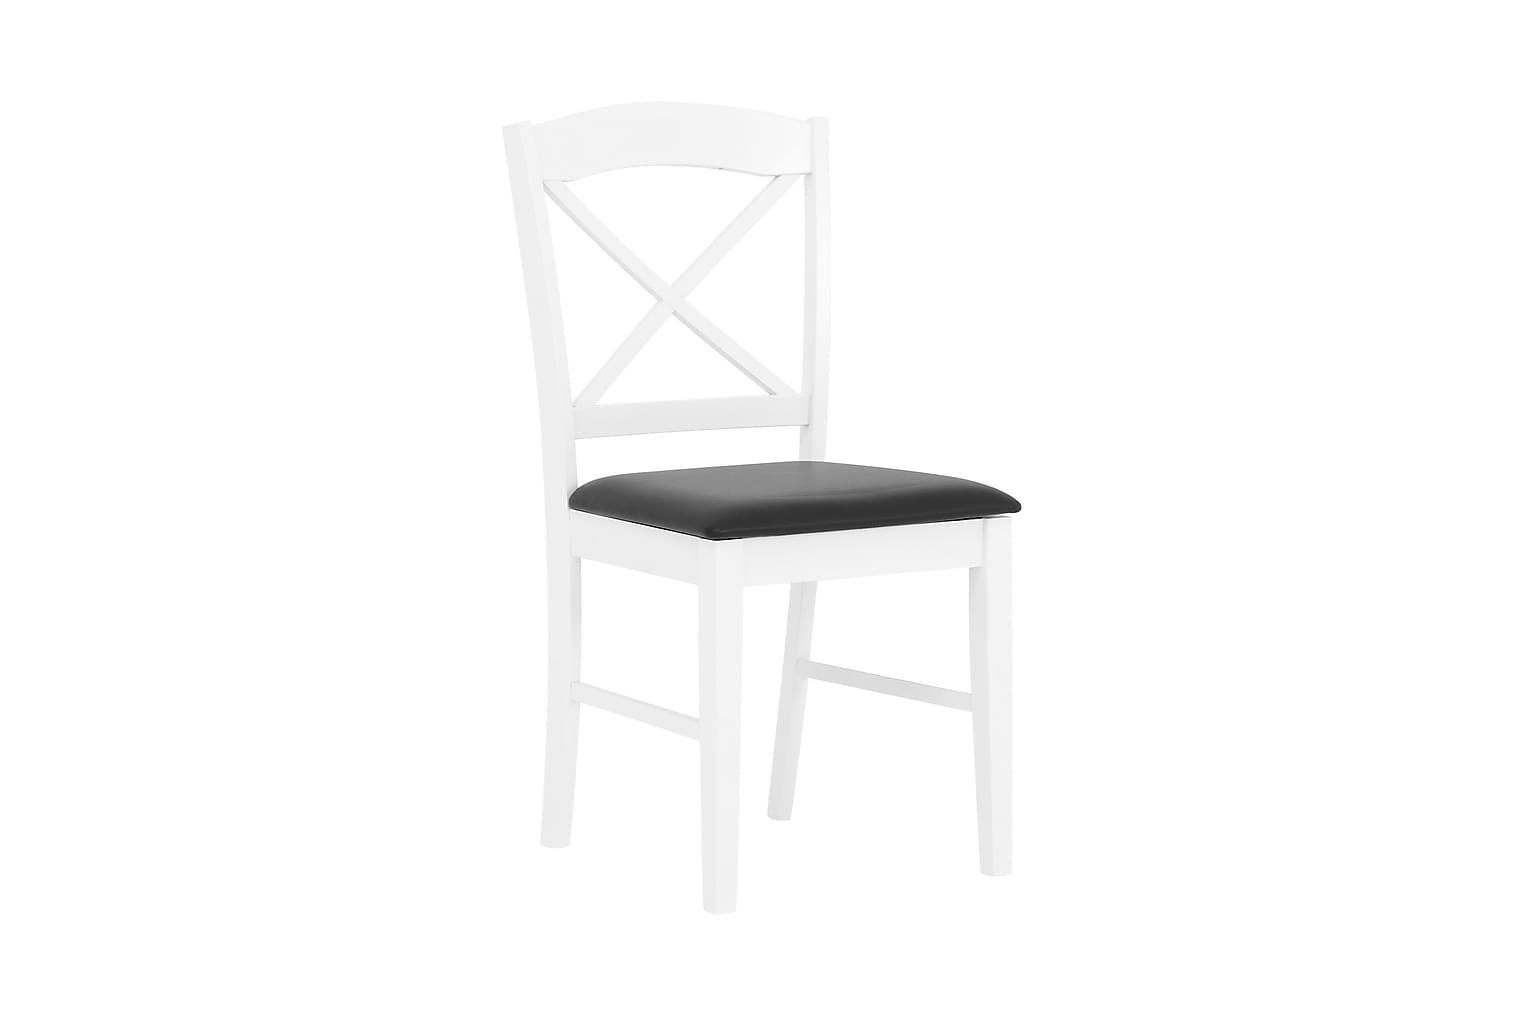 BRÖMSEBO Tuoli Valkoinen/Musta